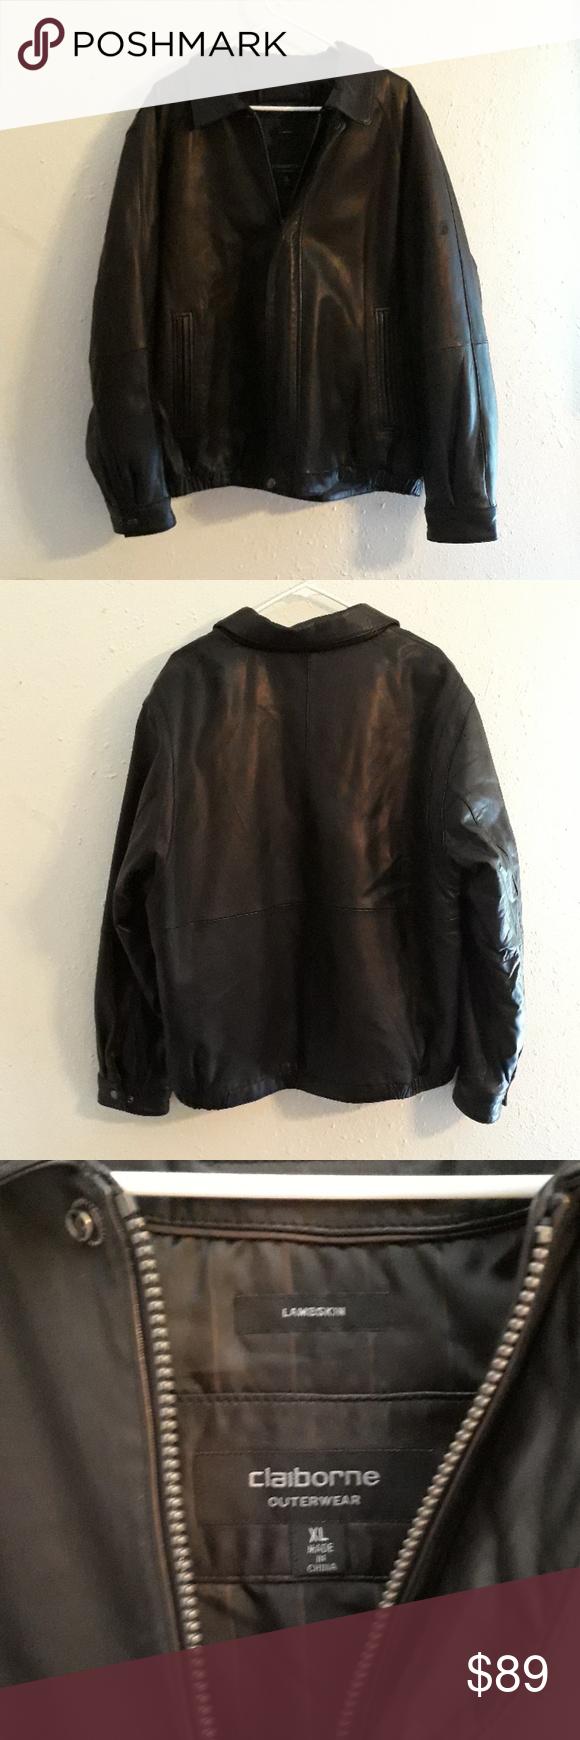 Liz Claiborne Mens Leather Lambskin Jacket Lambskin Jacket Liz Claiborne Clothes Design